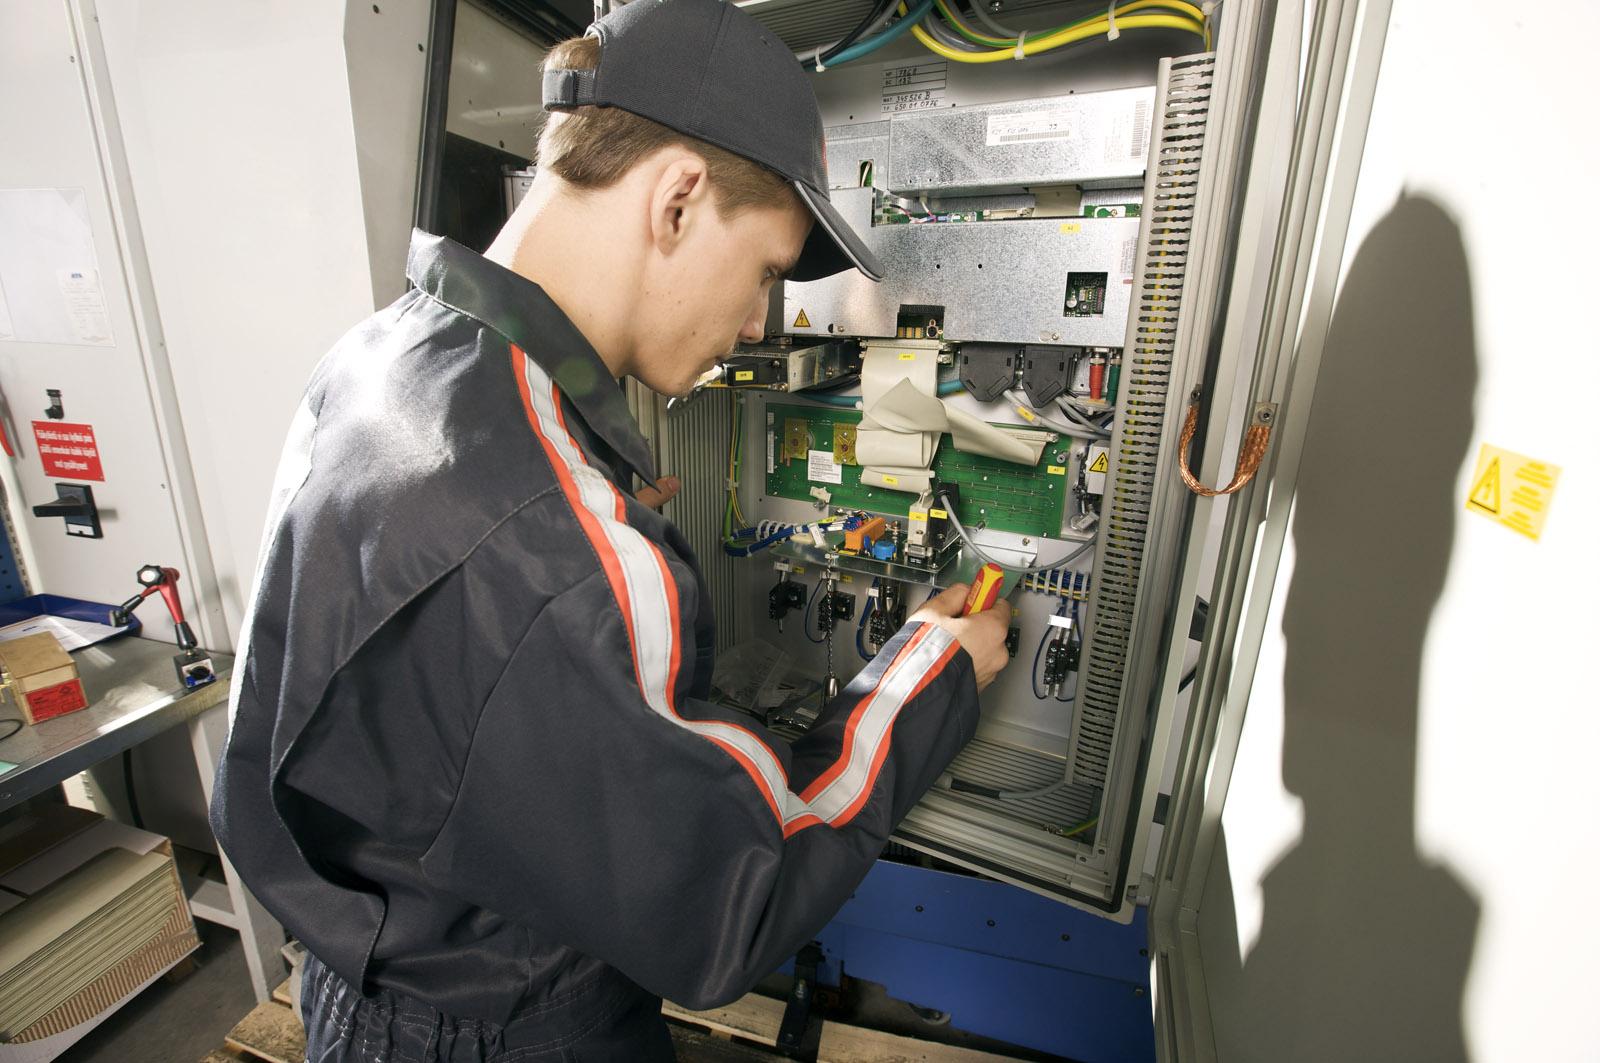 konecranes machine tool service offers range of retrofit